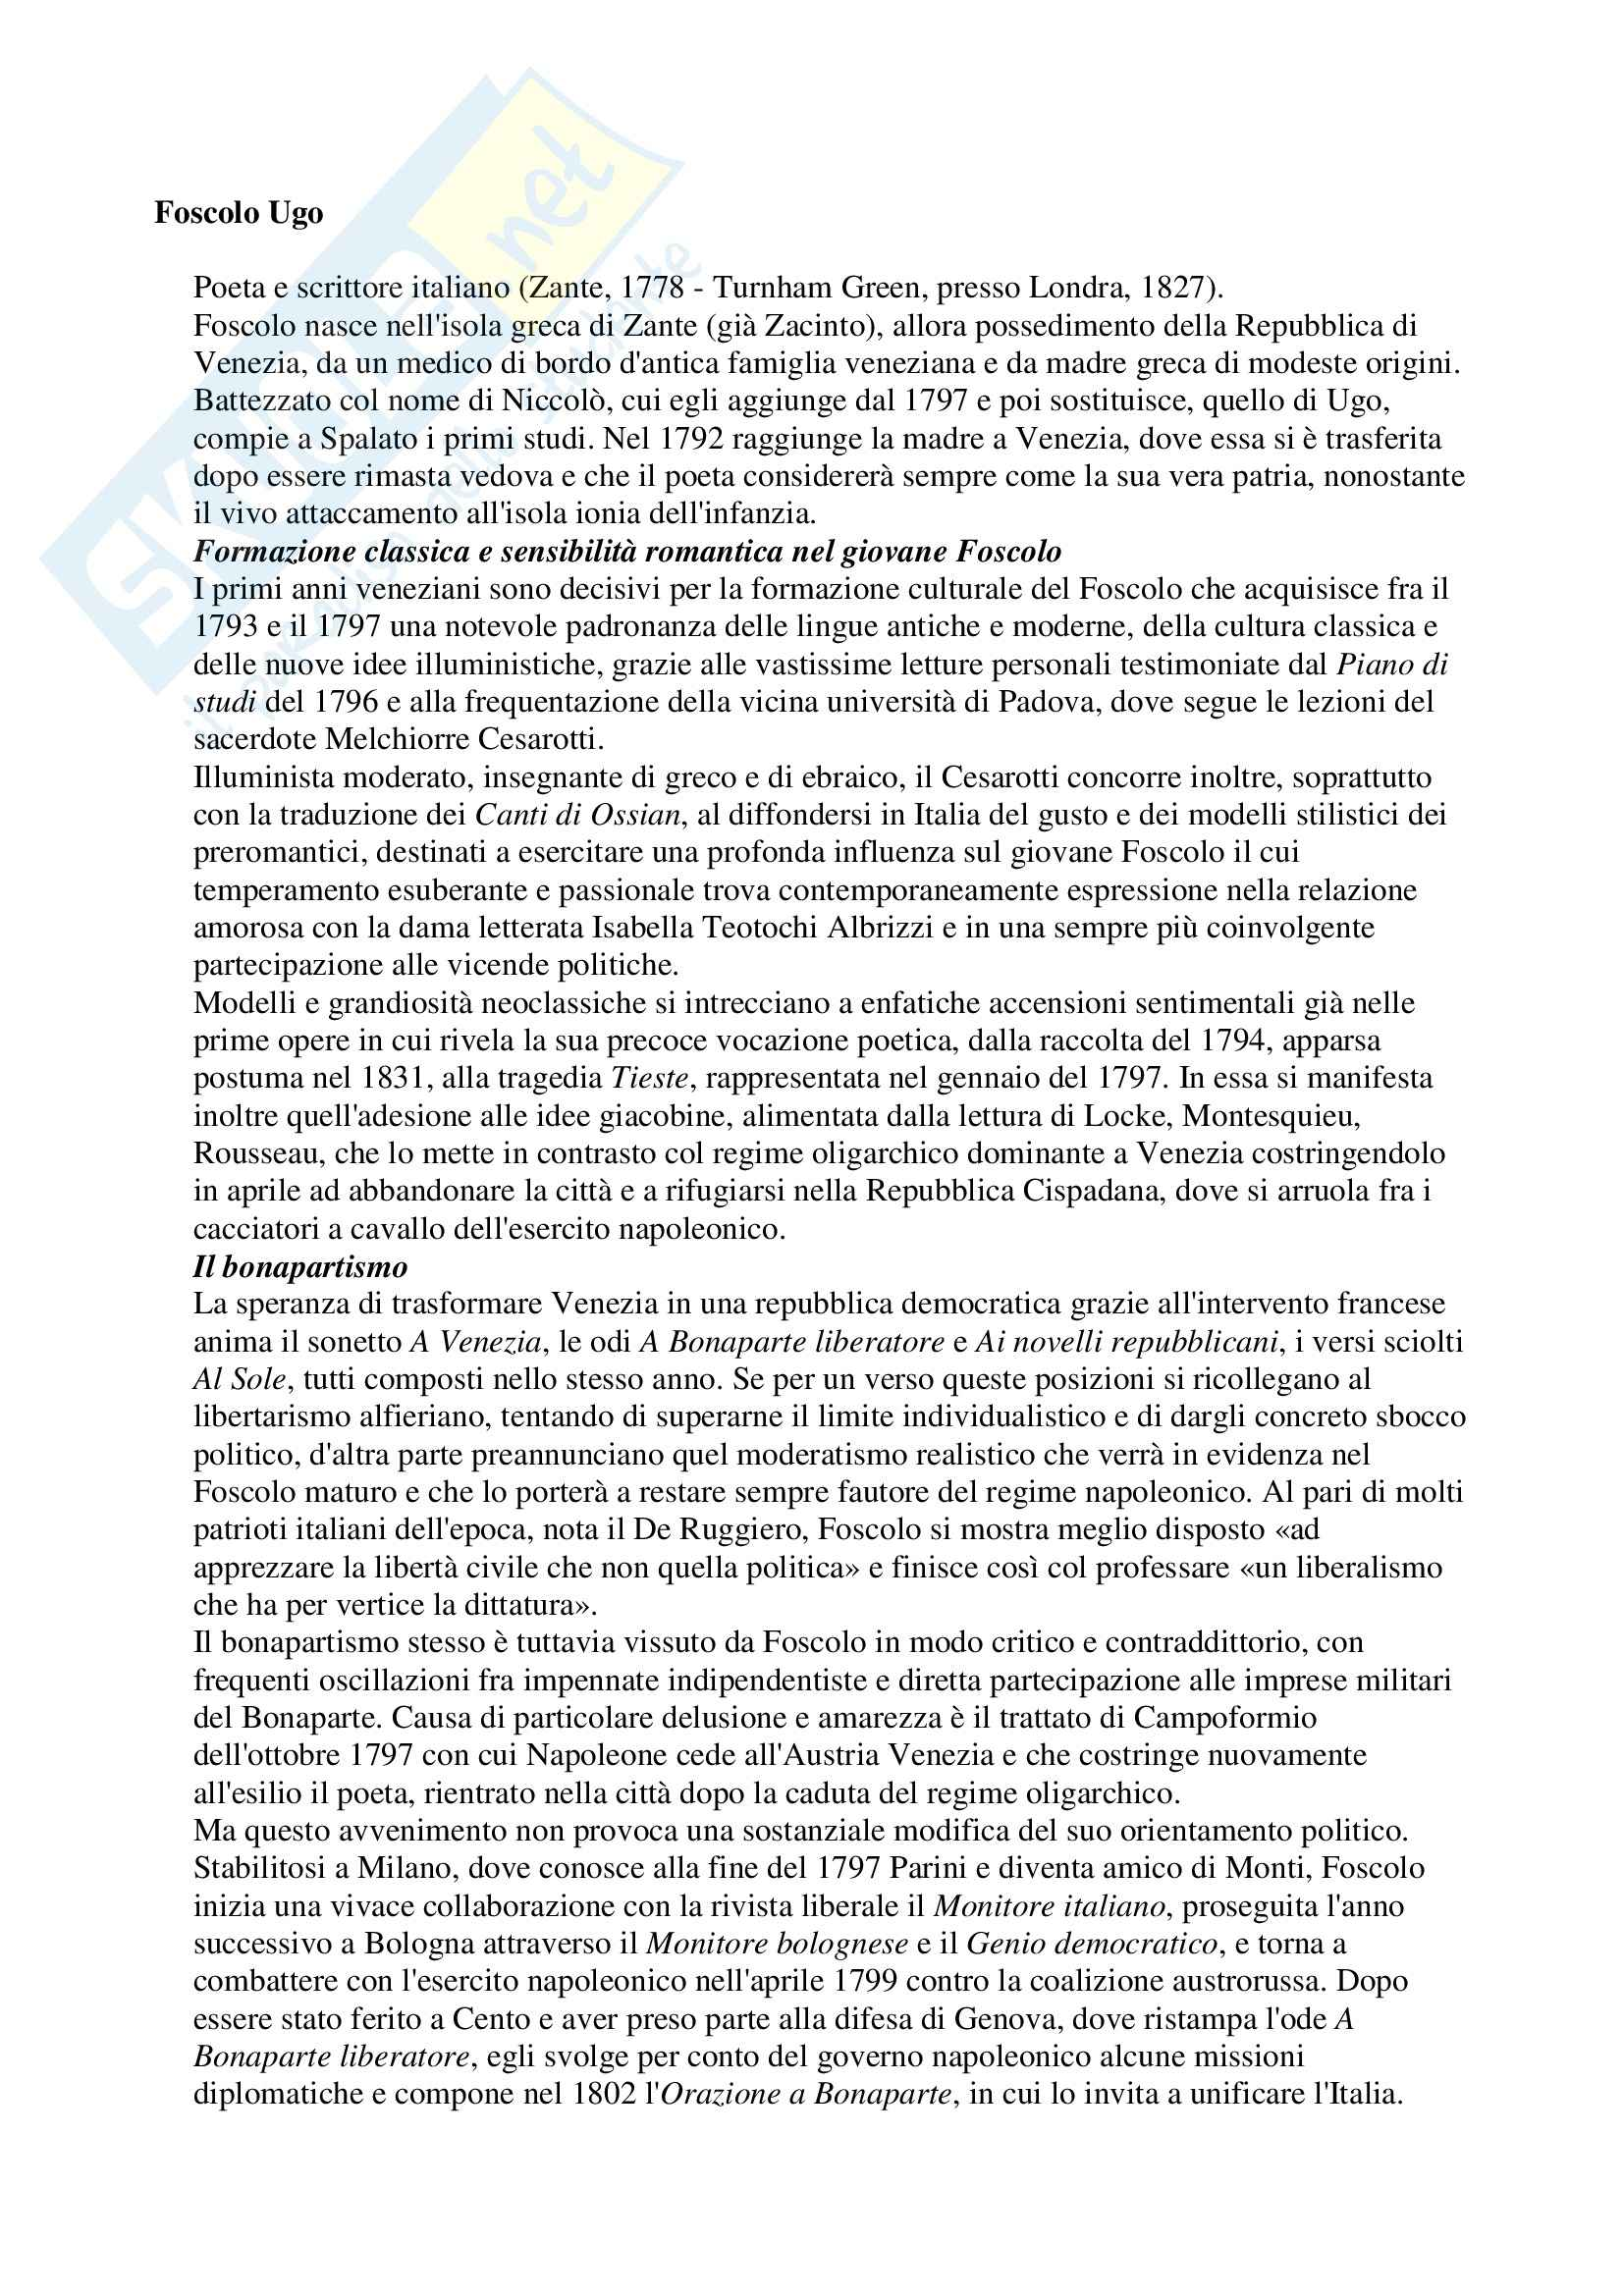 Letteratura italiana - Ugo Foscolo